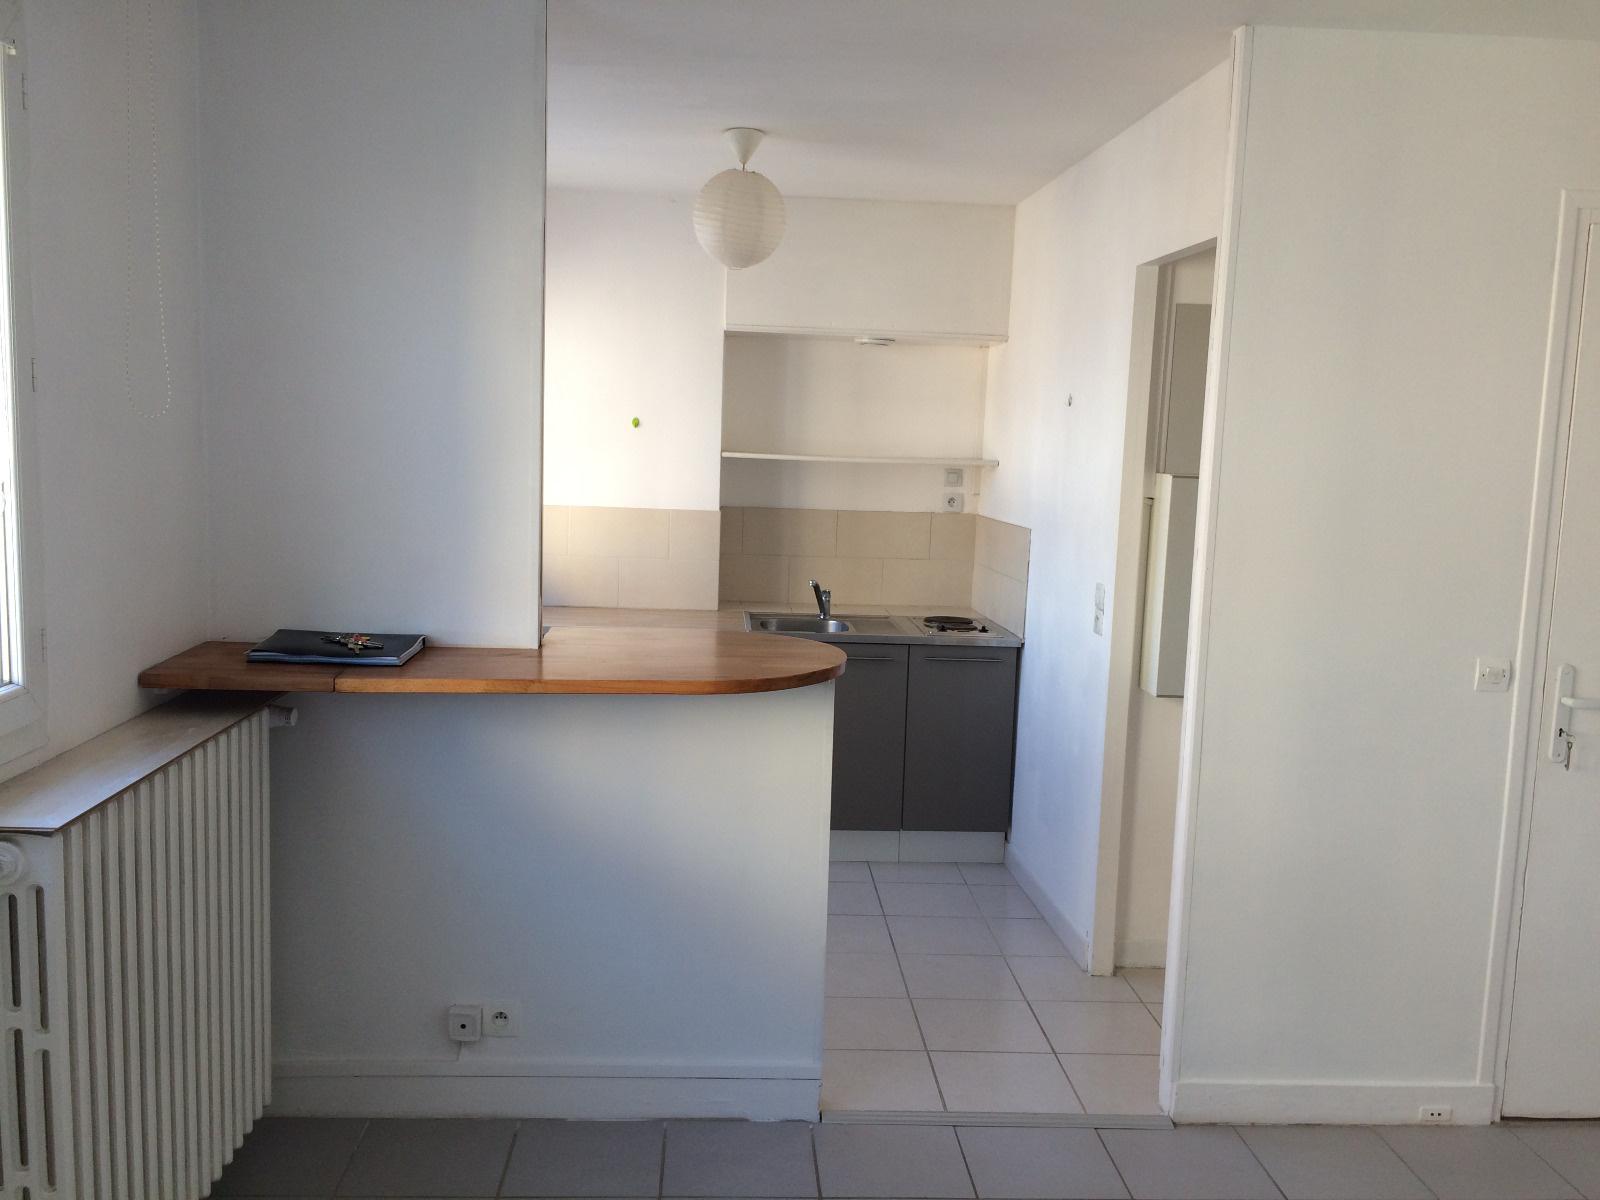 Offres de location Studio Paray-Vieille-Poste 91550